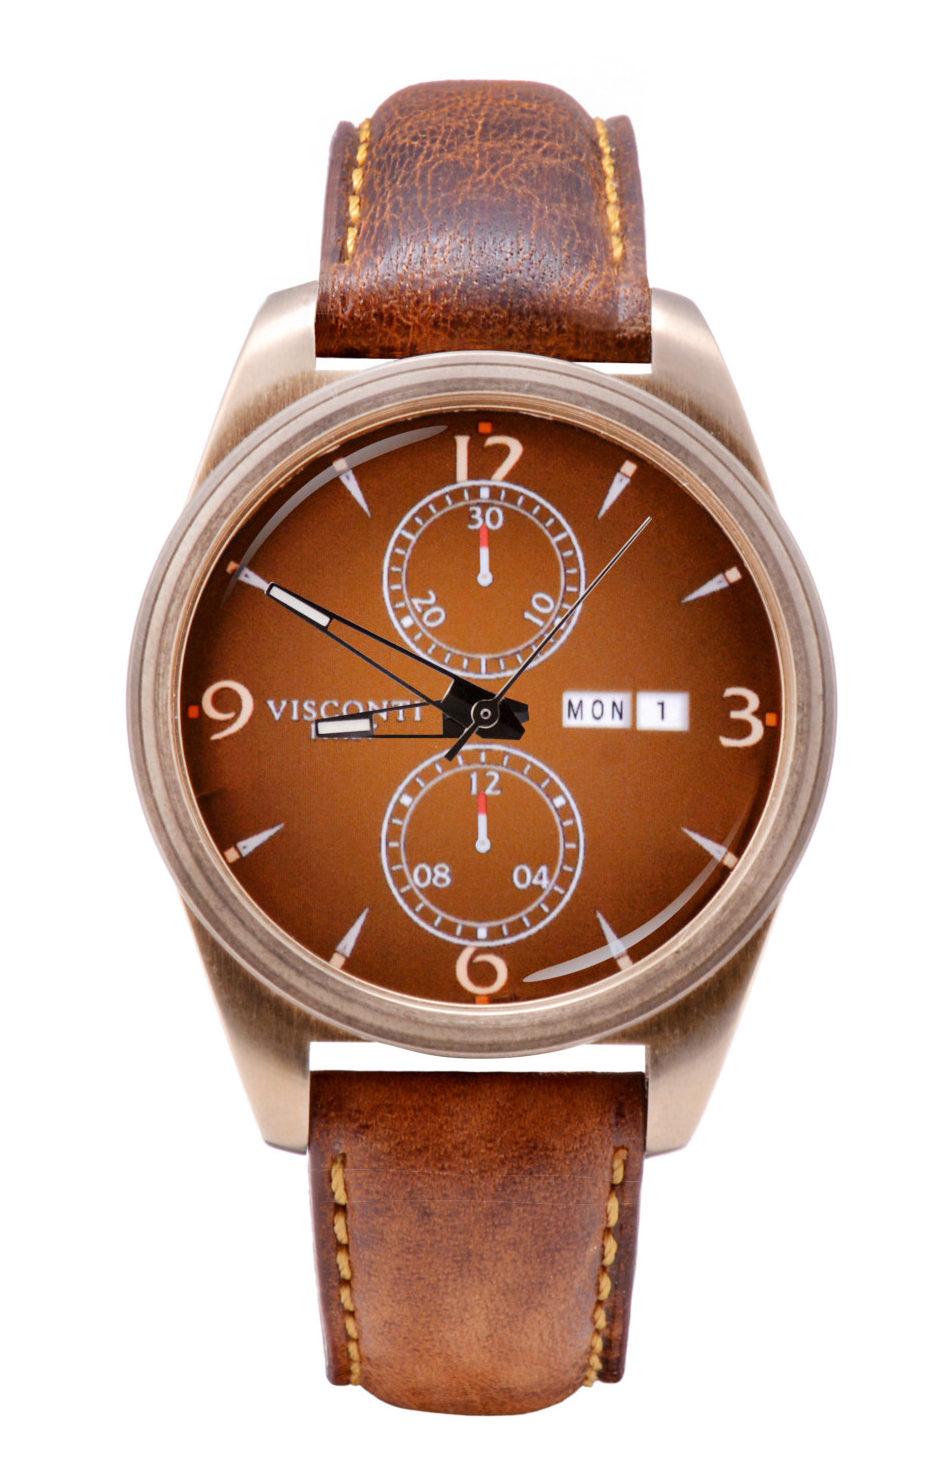 The Visconti Roma watch.